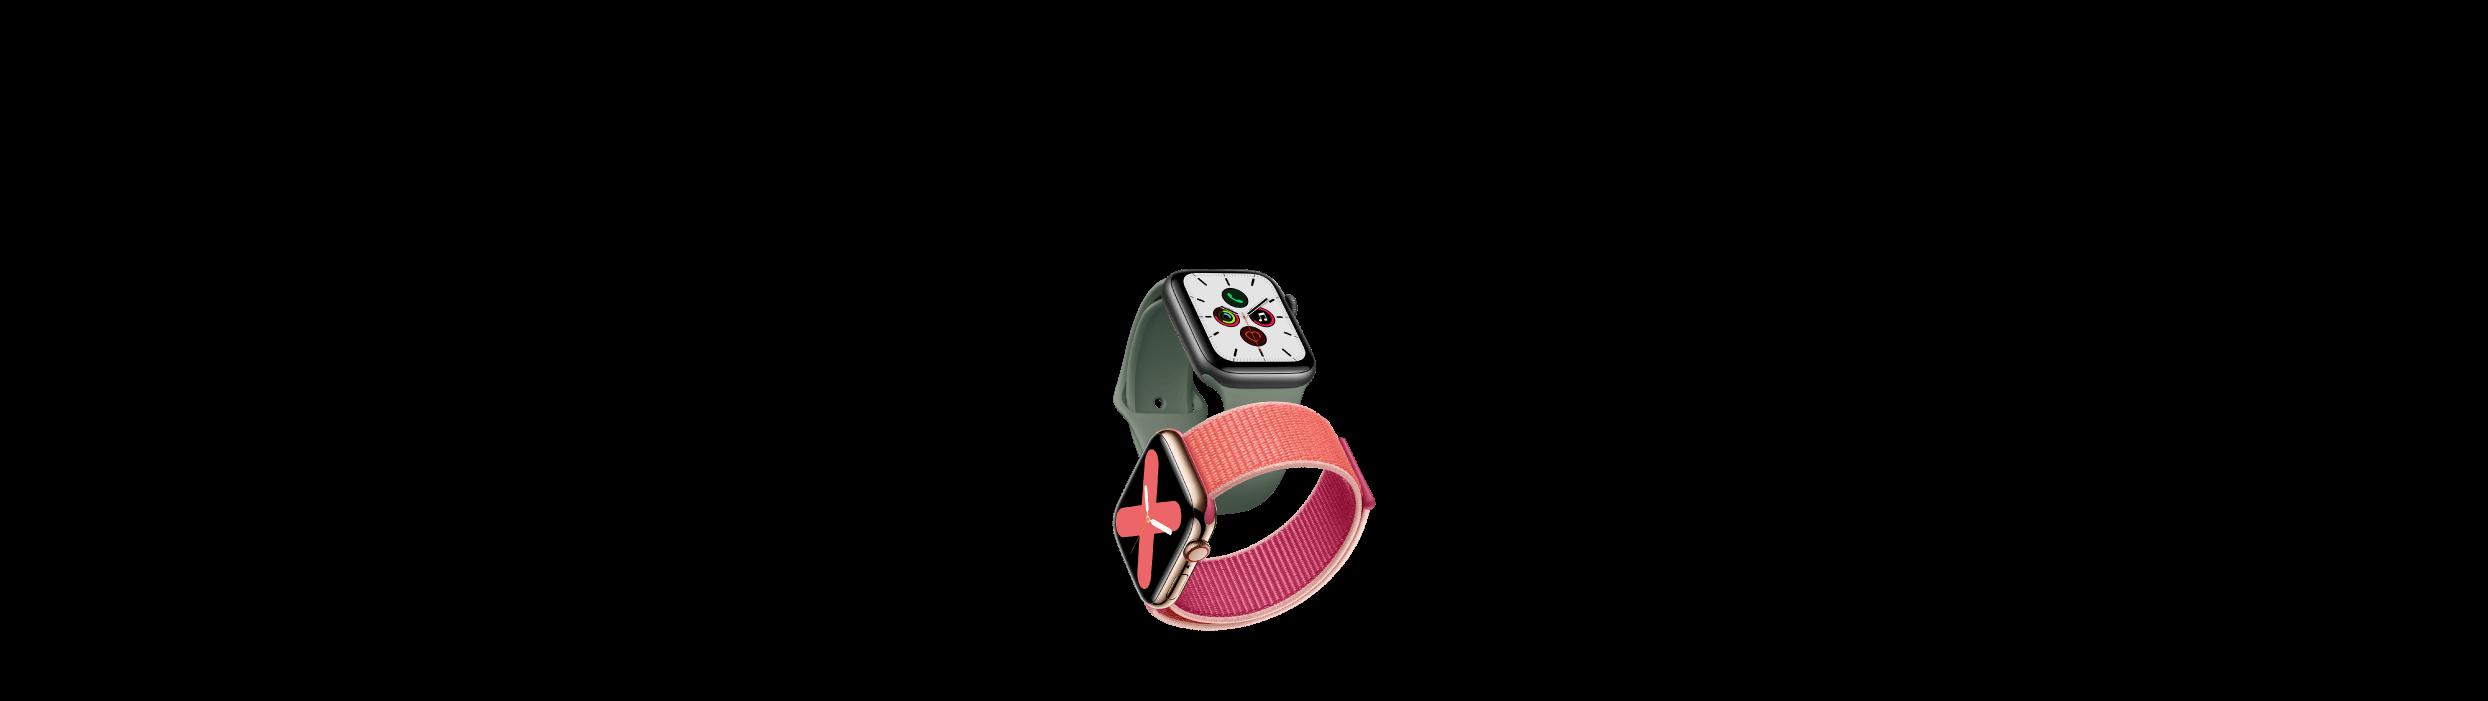 Apple Watch Series 5 | Main